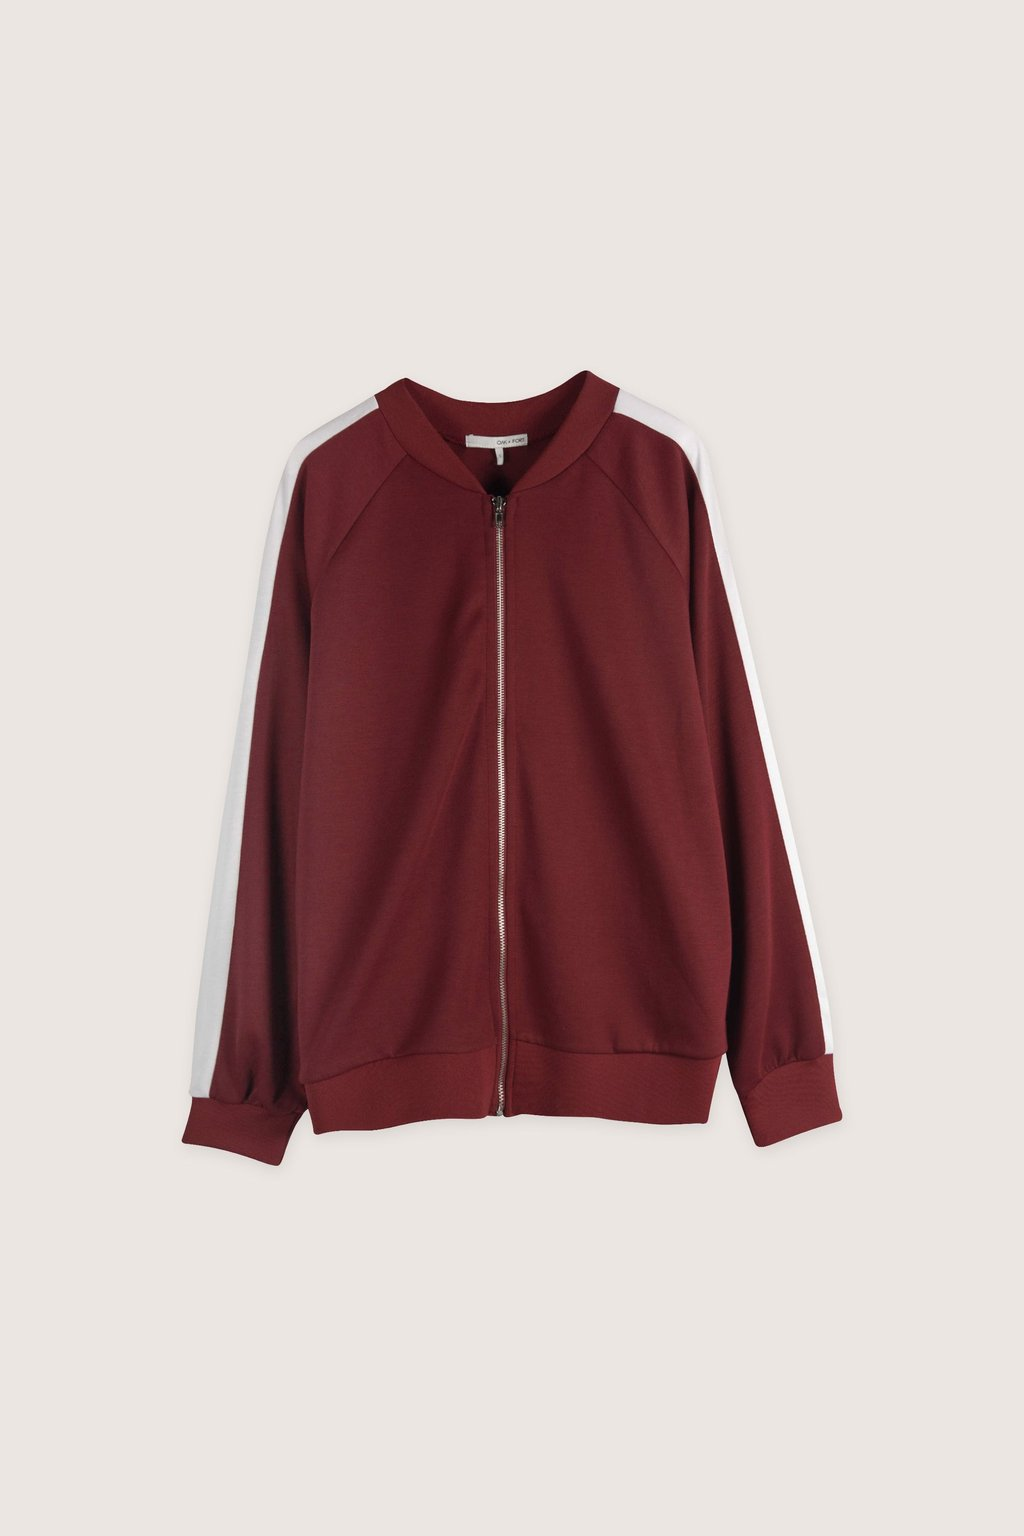 Jacket H162 Wine 5